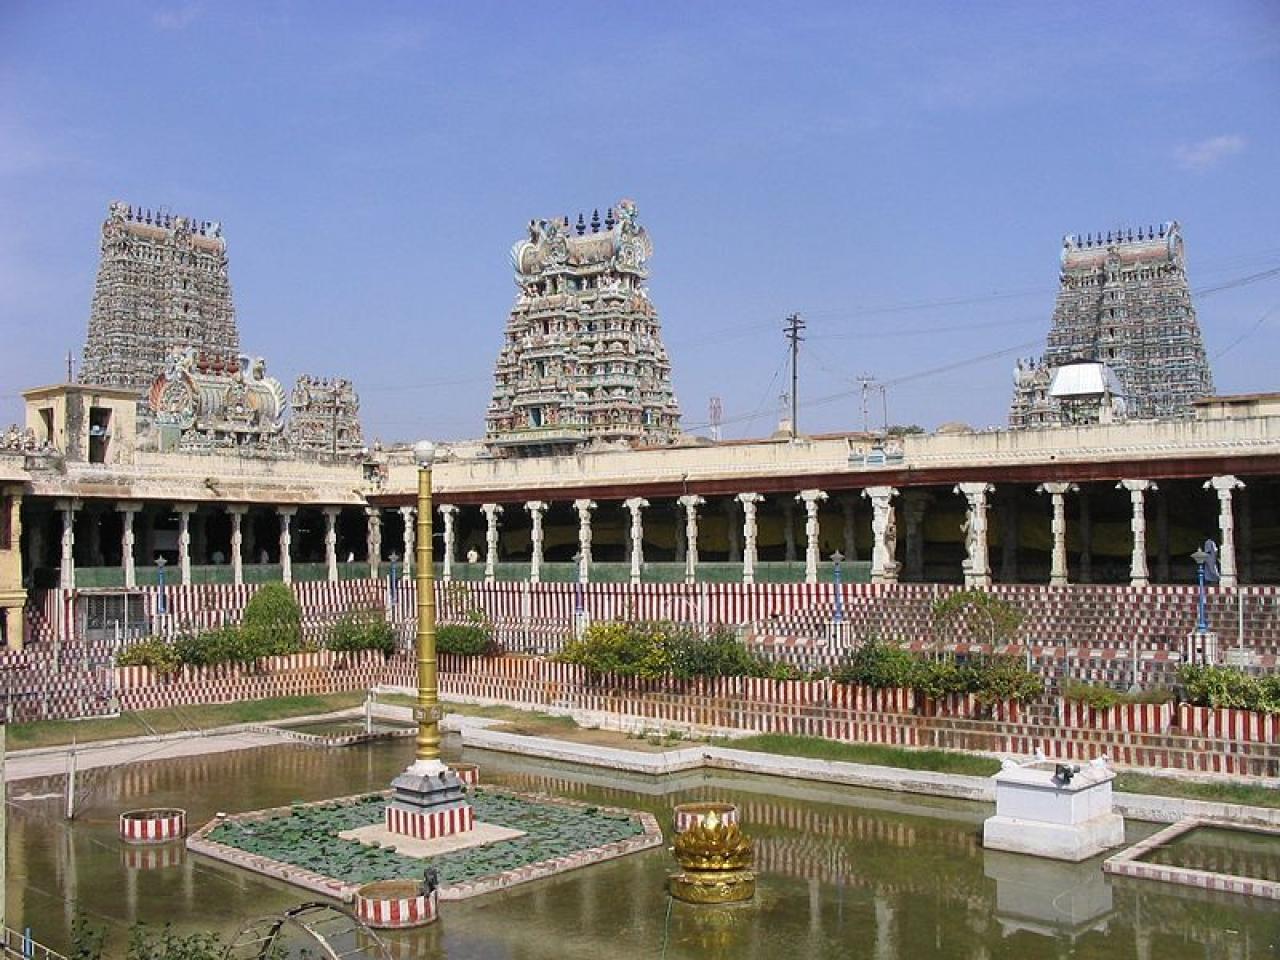 Meenakshi Sundareshwar Temple in Madurai